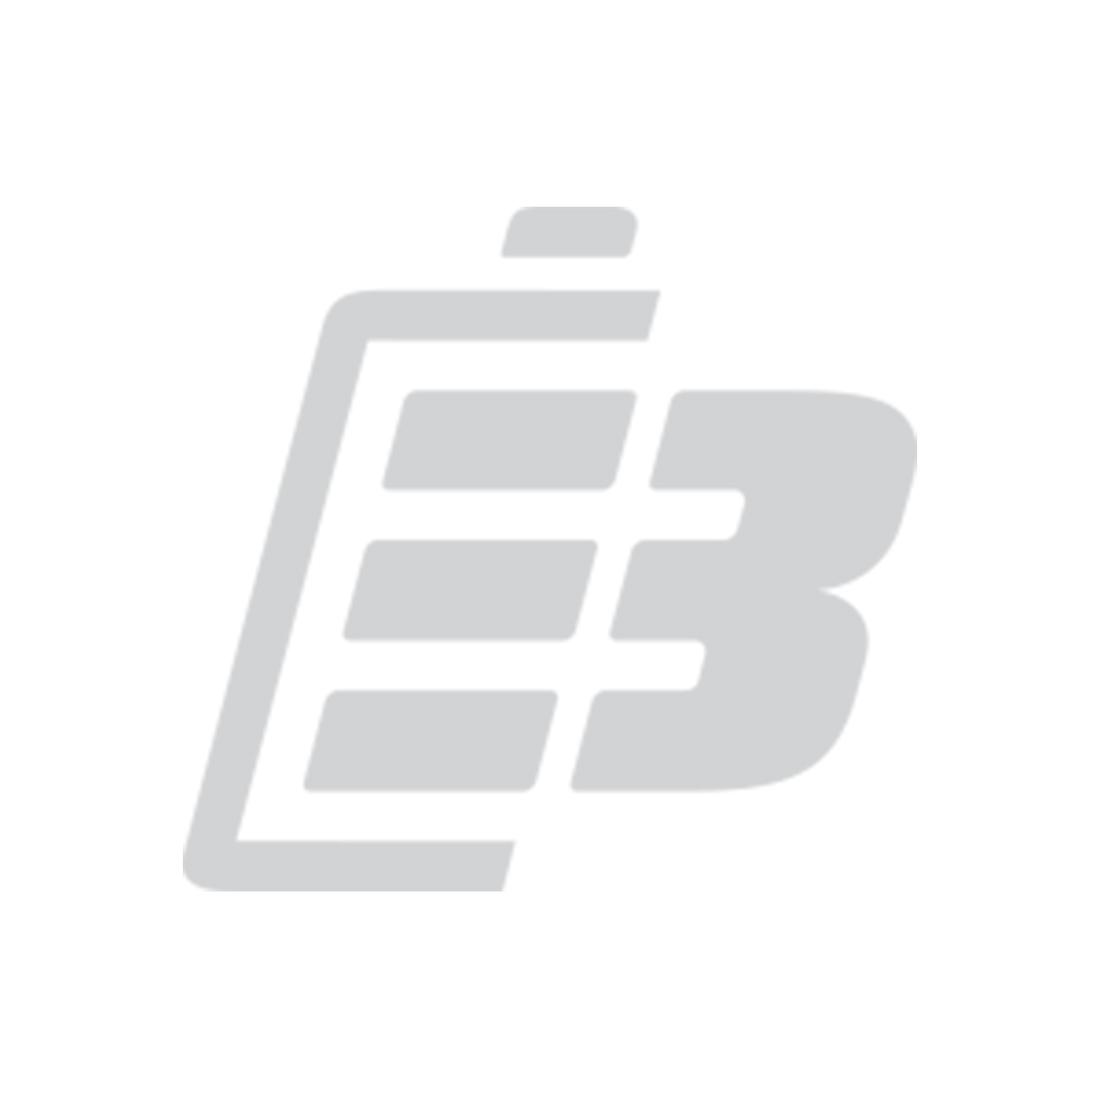 Choetech SC001 Foldable Solar Charger 19W 1